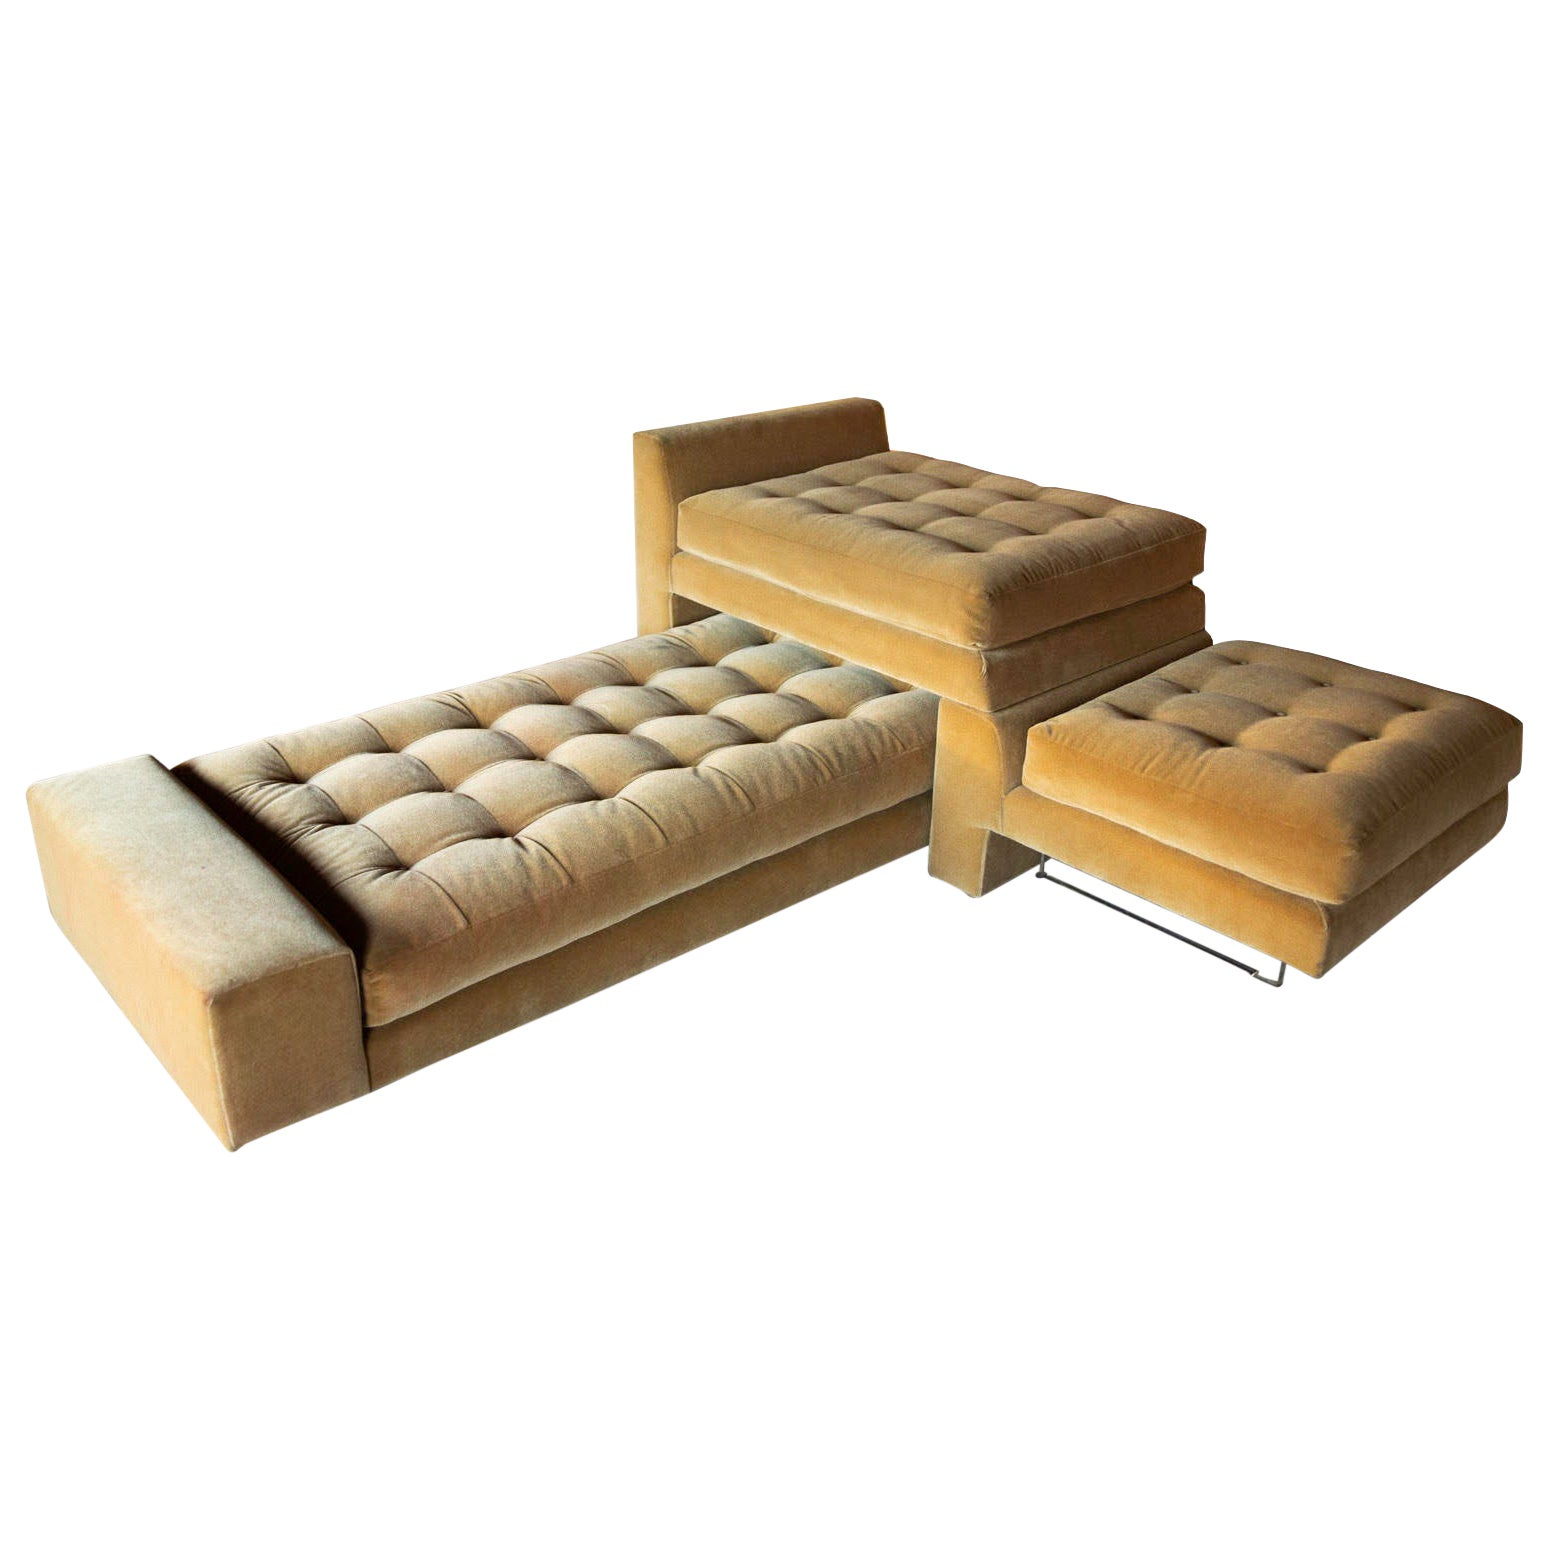 Vladimir Kagan Omnibus Modular Sofa in Mohair